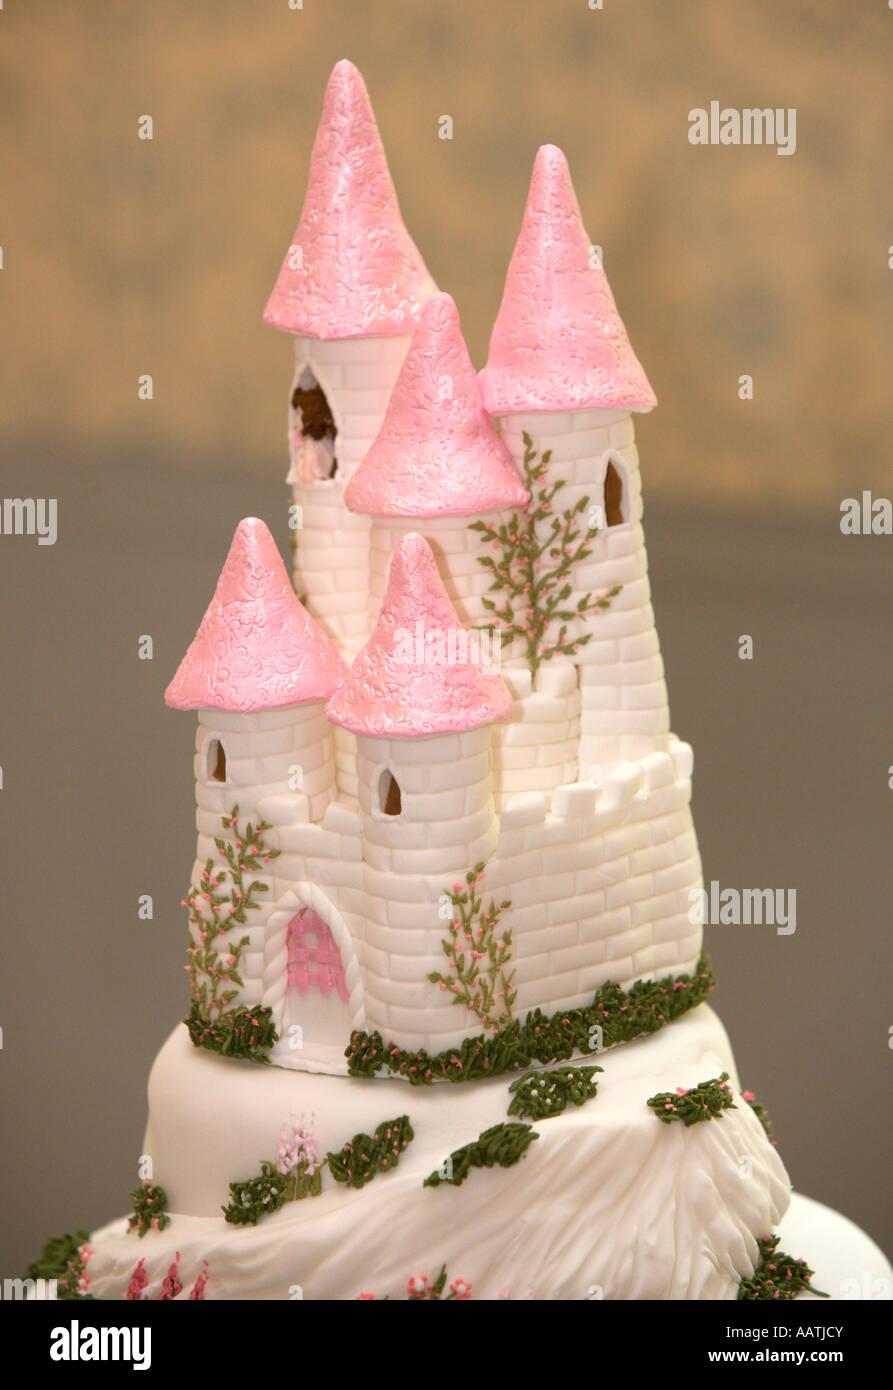 Unusual Wedding Cake Stock Photos & Unusual Wedding Cake Stock ...